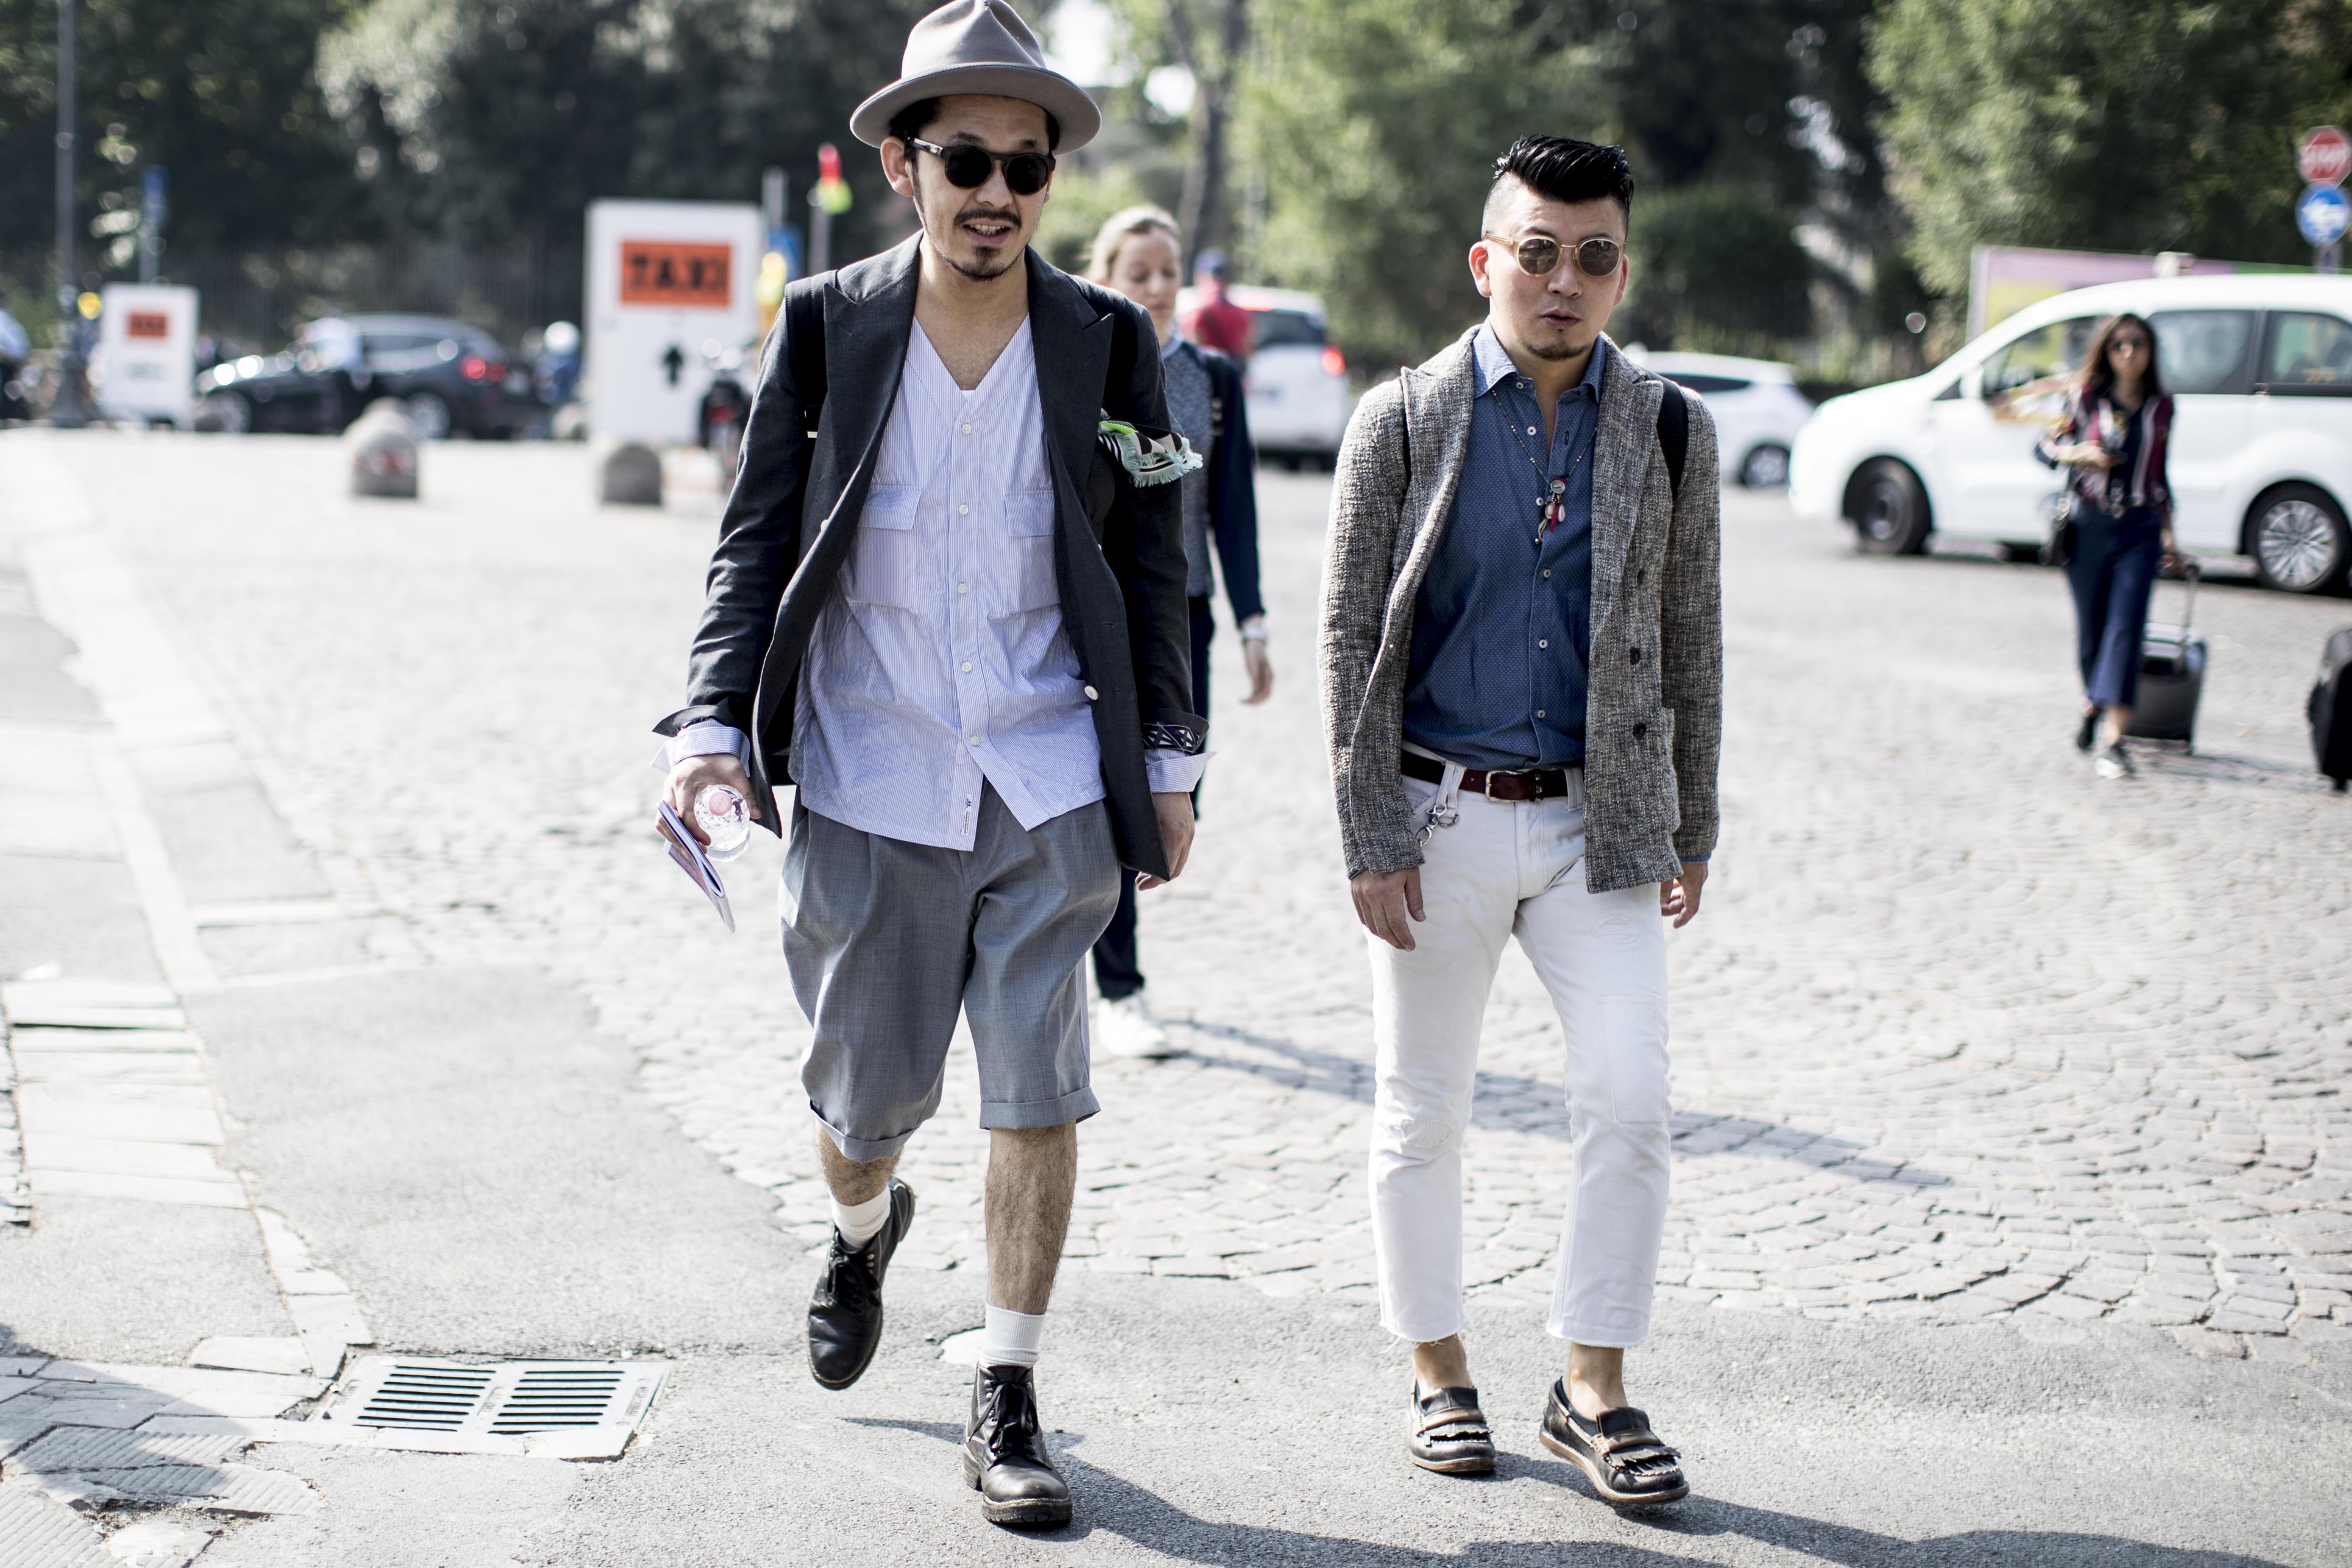 Firenze Pitti Uomo Fashion Week Men's Street Style Spring 2018 Day 4